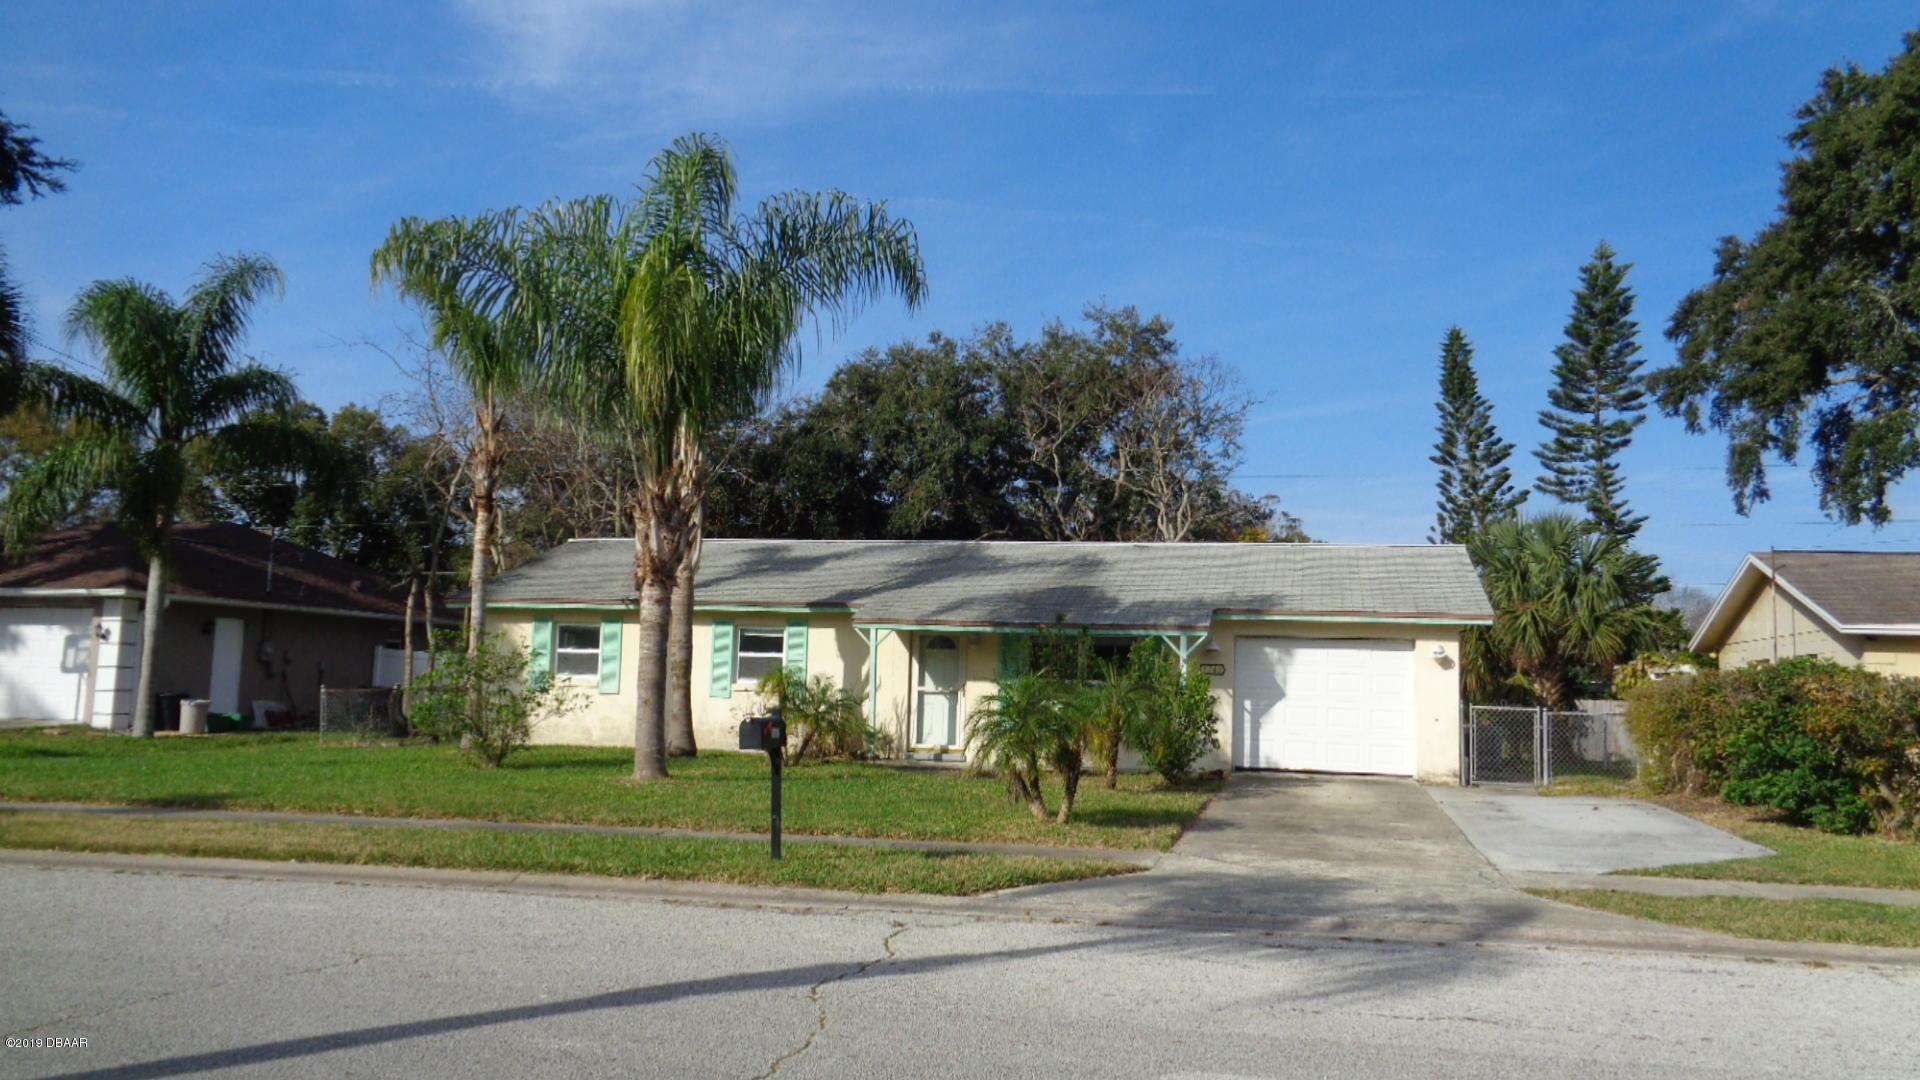 1742 Eastern Road, South Daytona, Florida